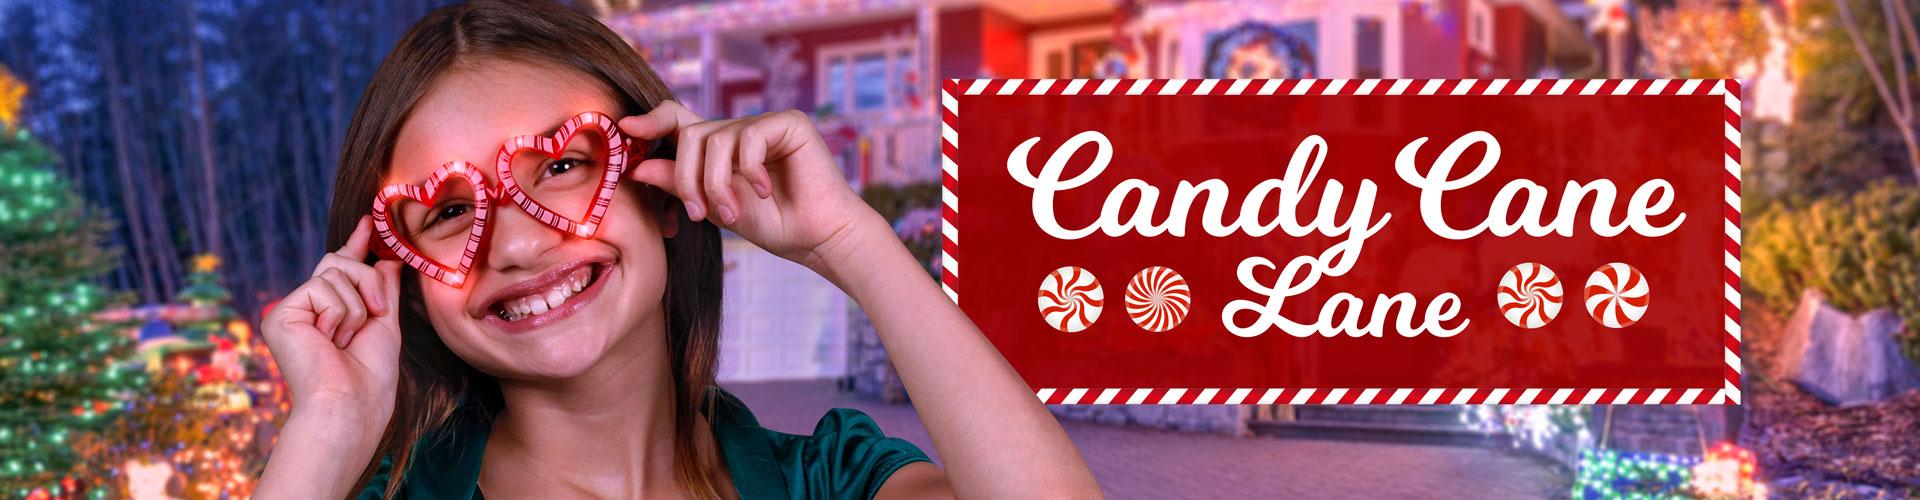 Candy Cane Lane Promo Banner